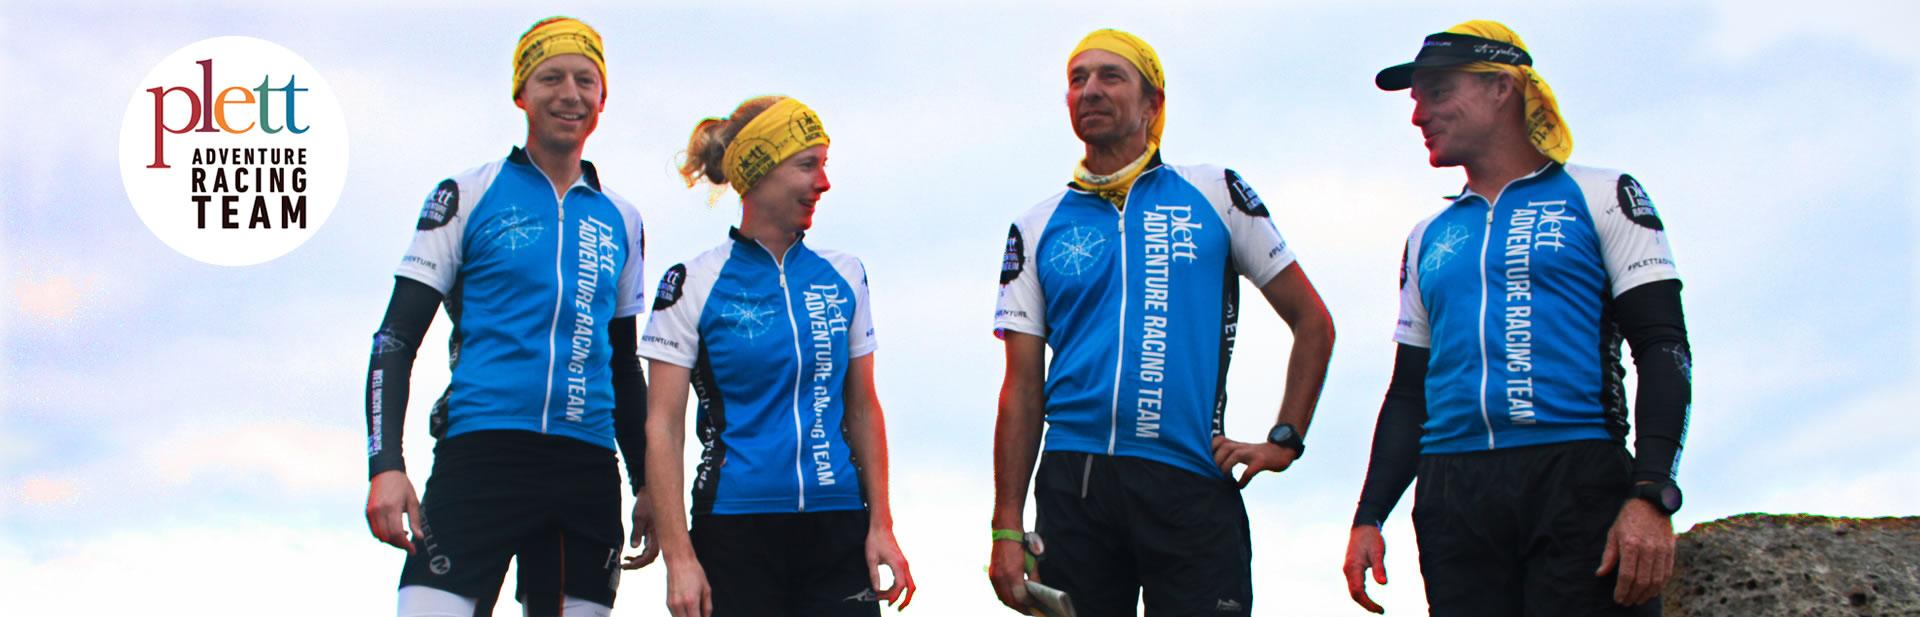 The Plett Adventure Racing Team: Petrus Maree, Kate Southey, Drew Scott and Andrew Damp